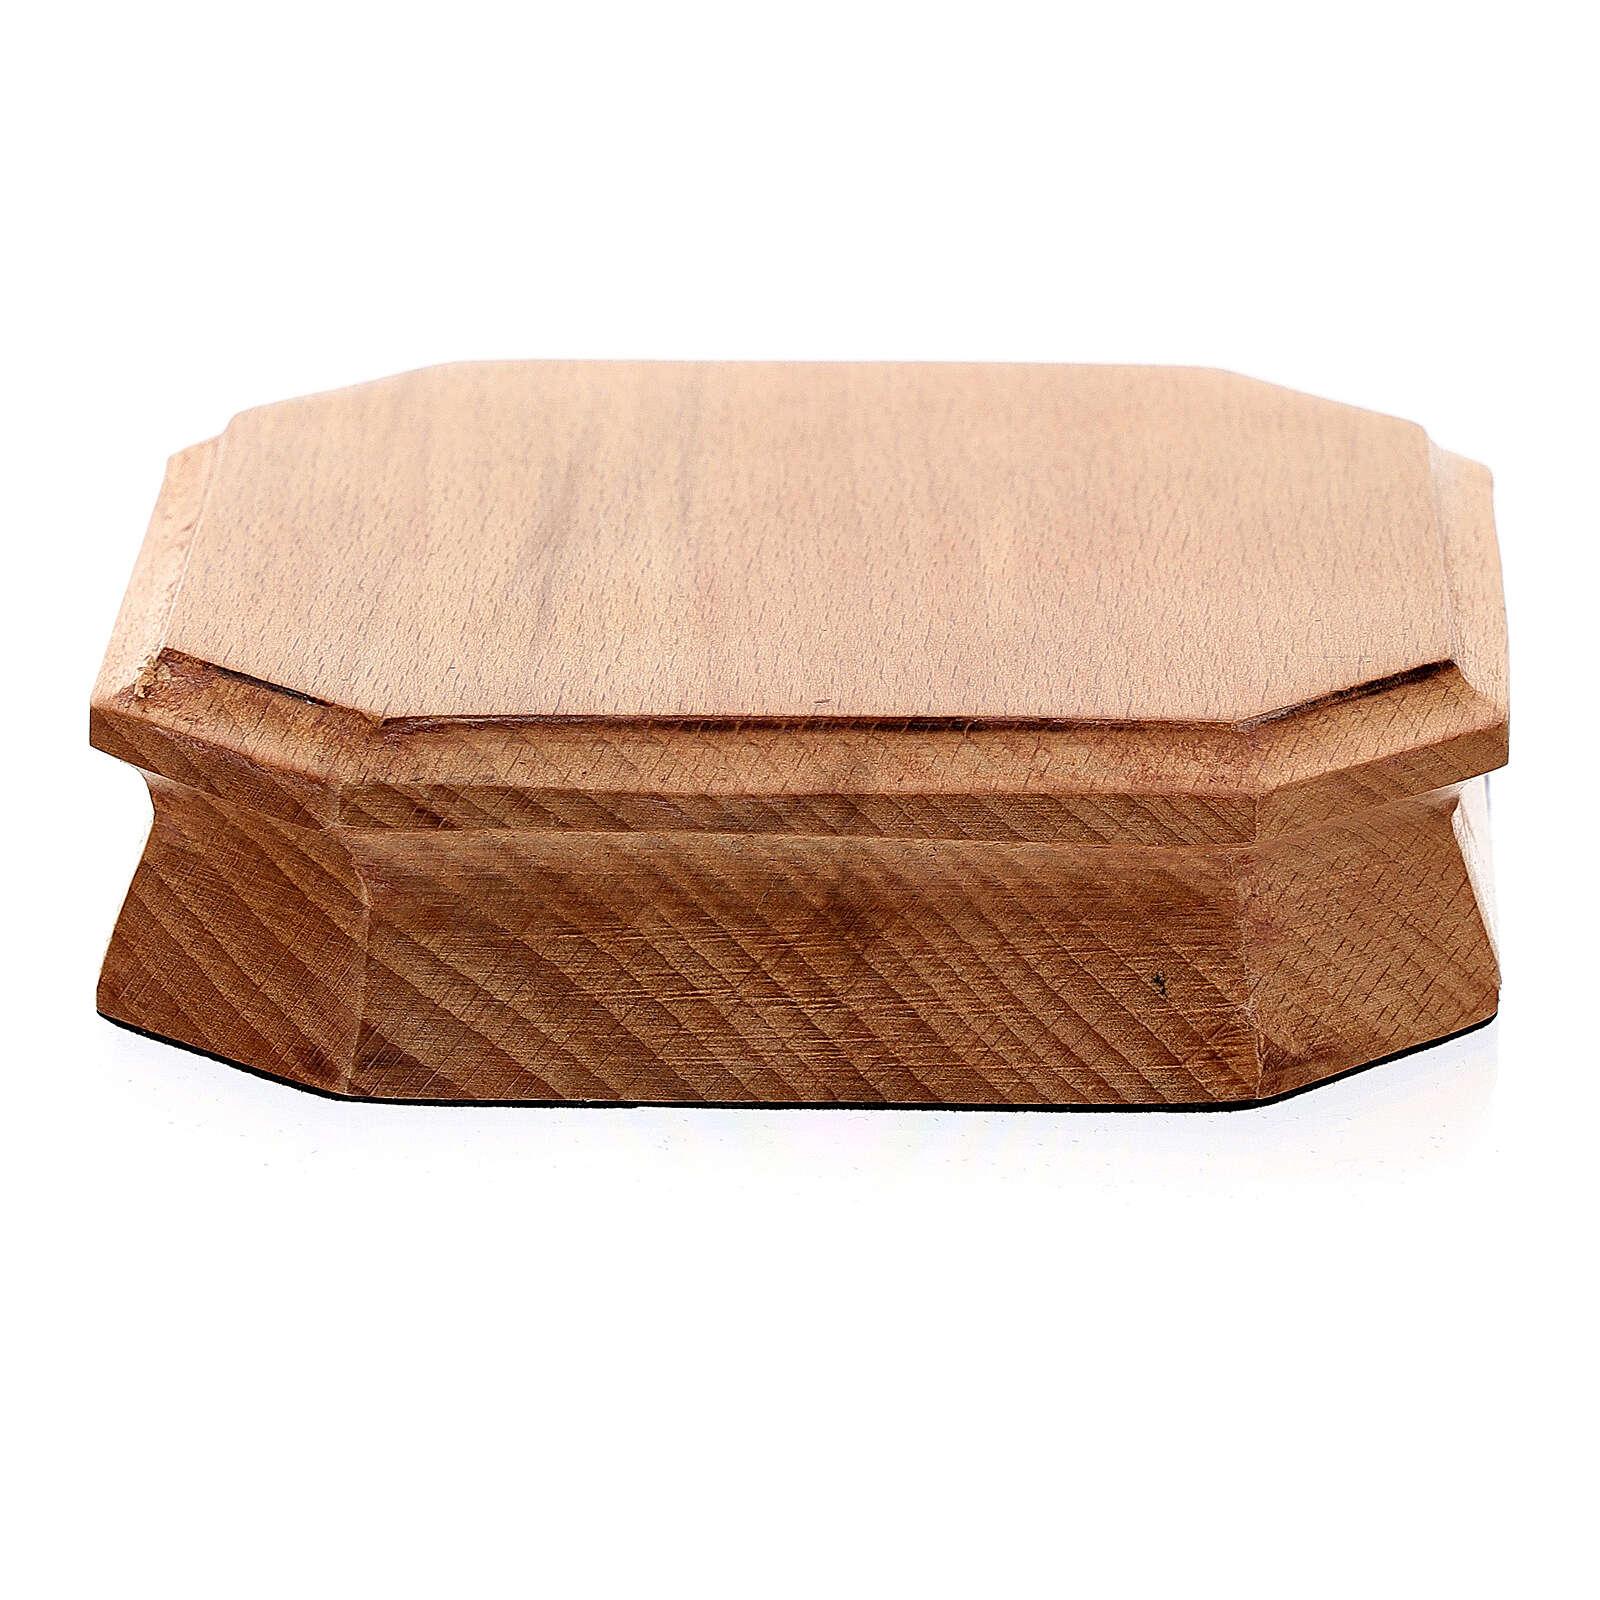 Trône octogonal bois clair 10x10 cm 4